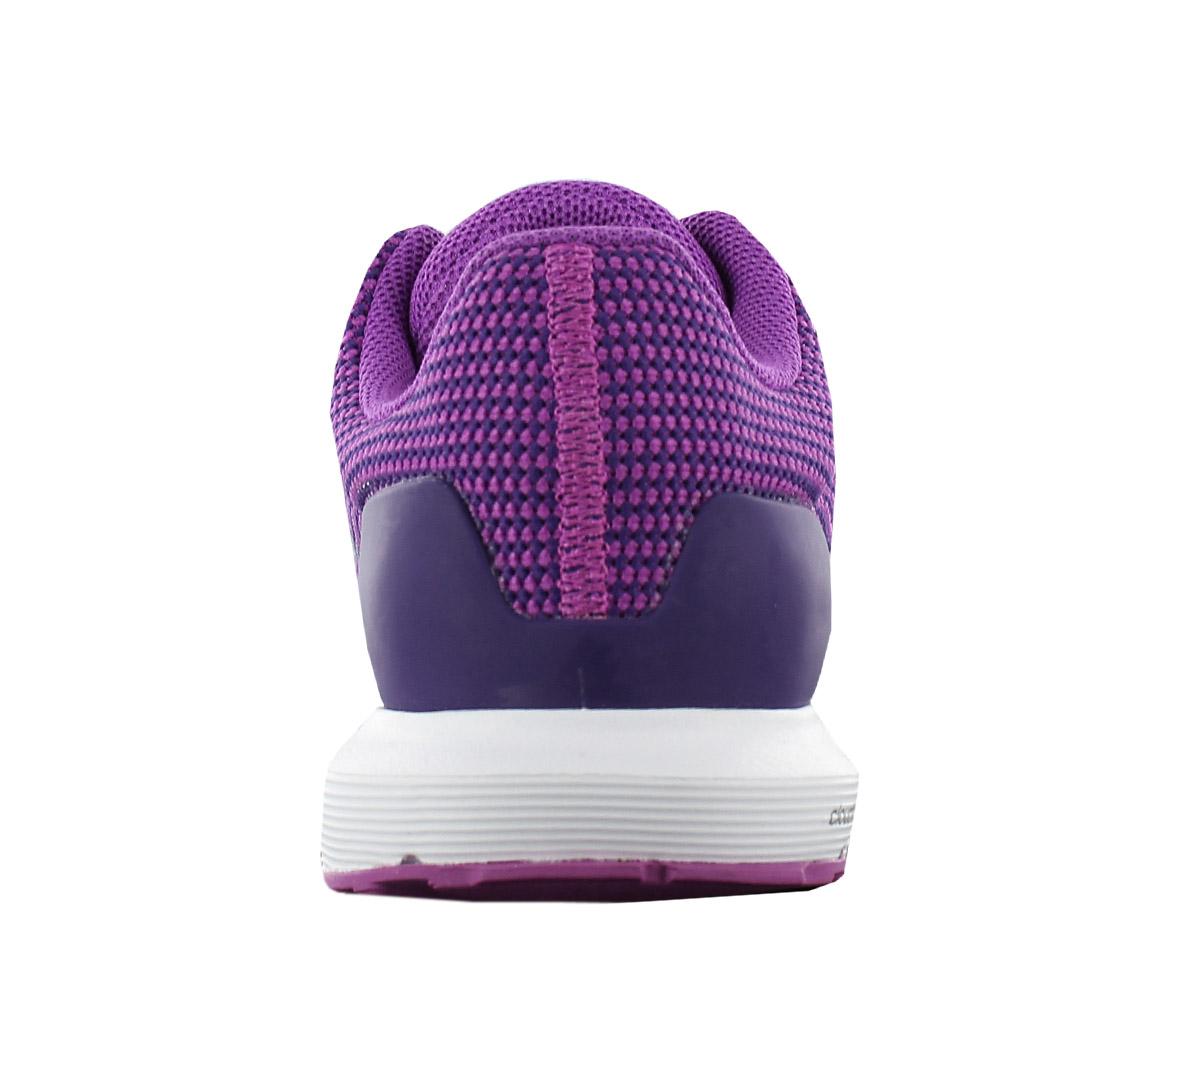 304808dbf0ce Adidas Cloudfoam Cosmic W-Women s Running Shoes Fitness Sport Shoes ...